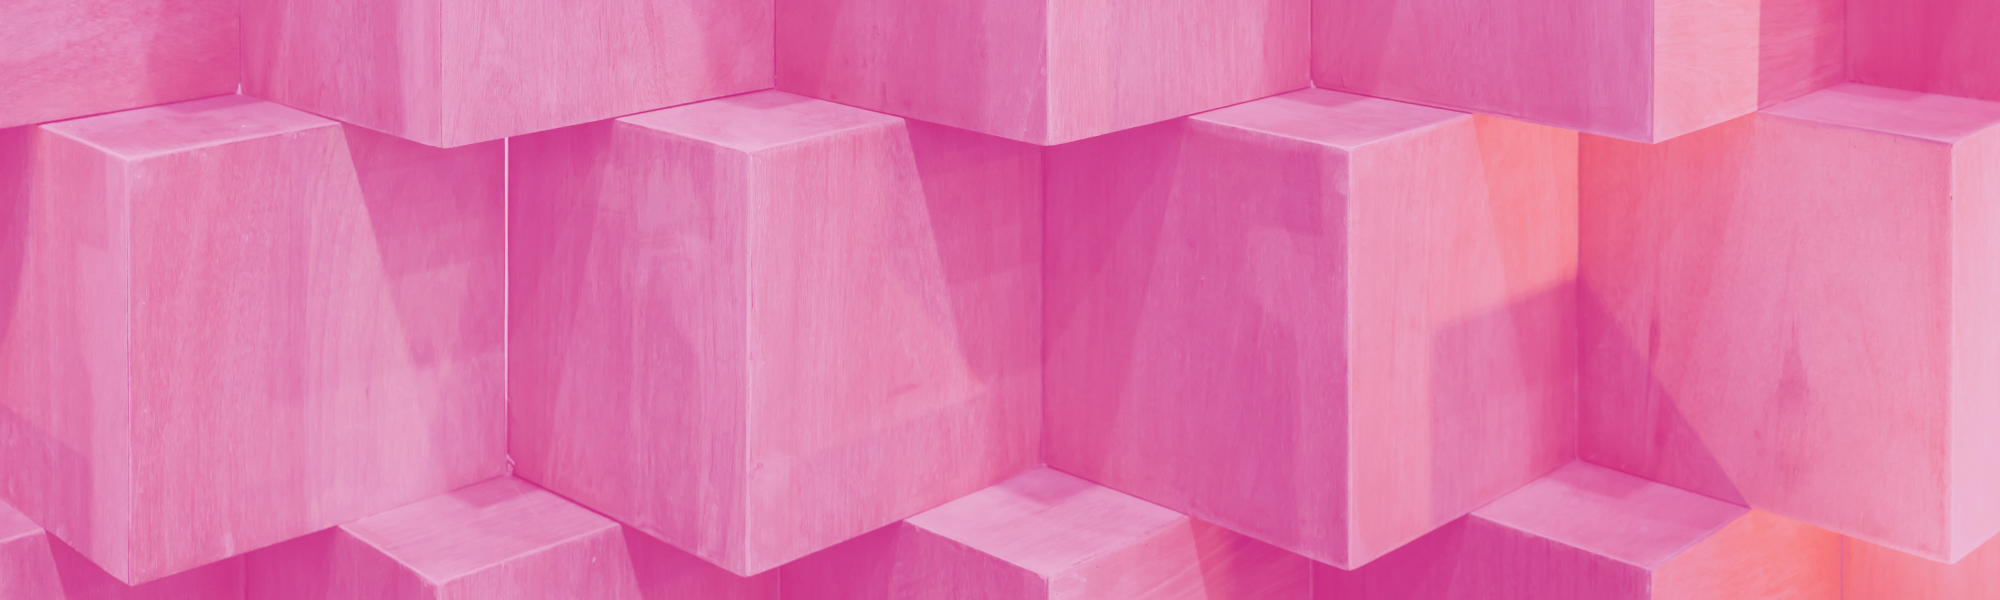 2000x600_cubes-colduo.jpg